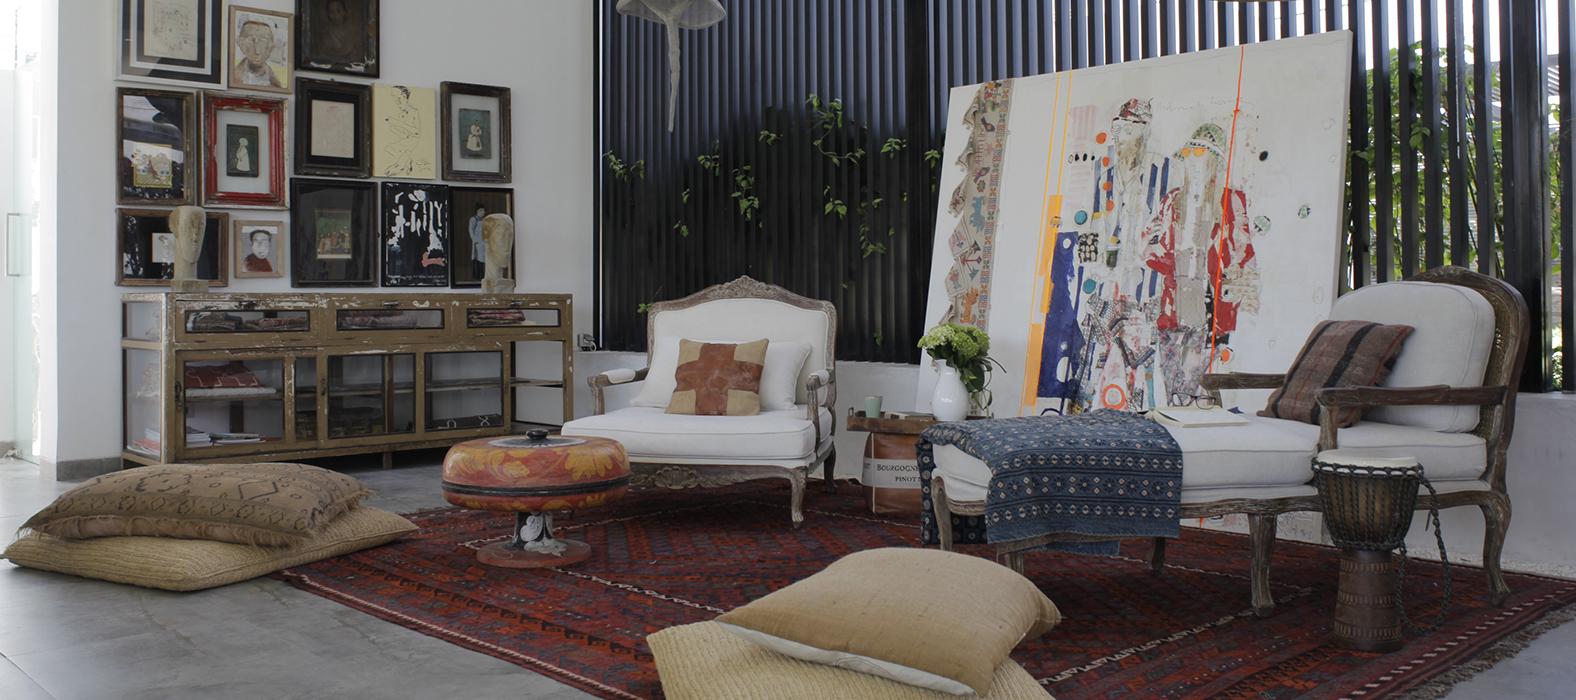 villa suami julias bali lounge